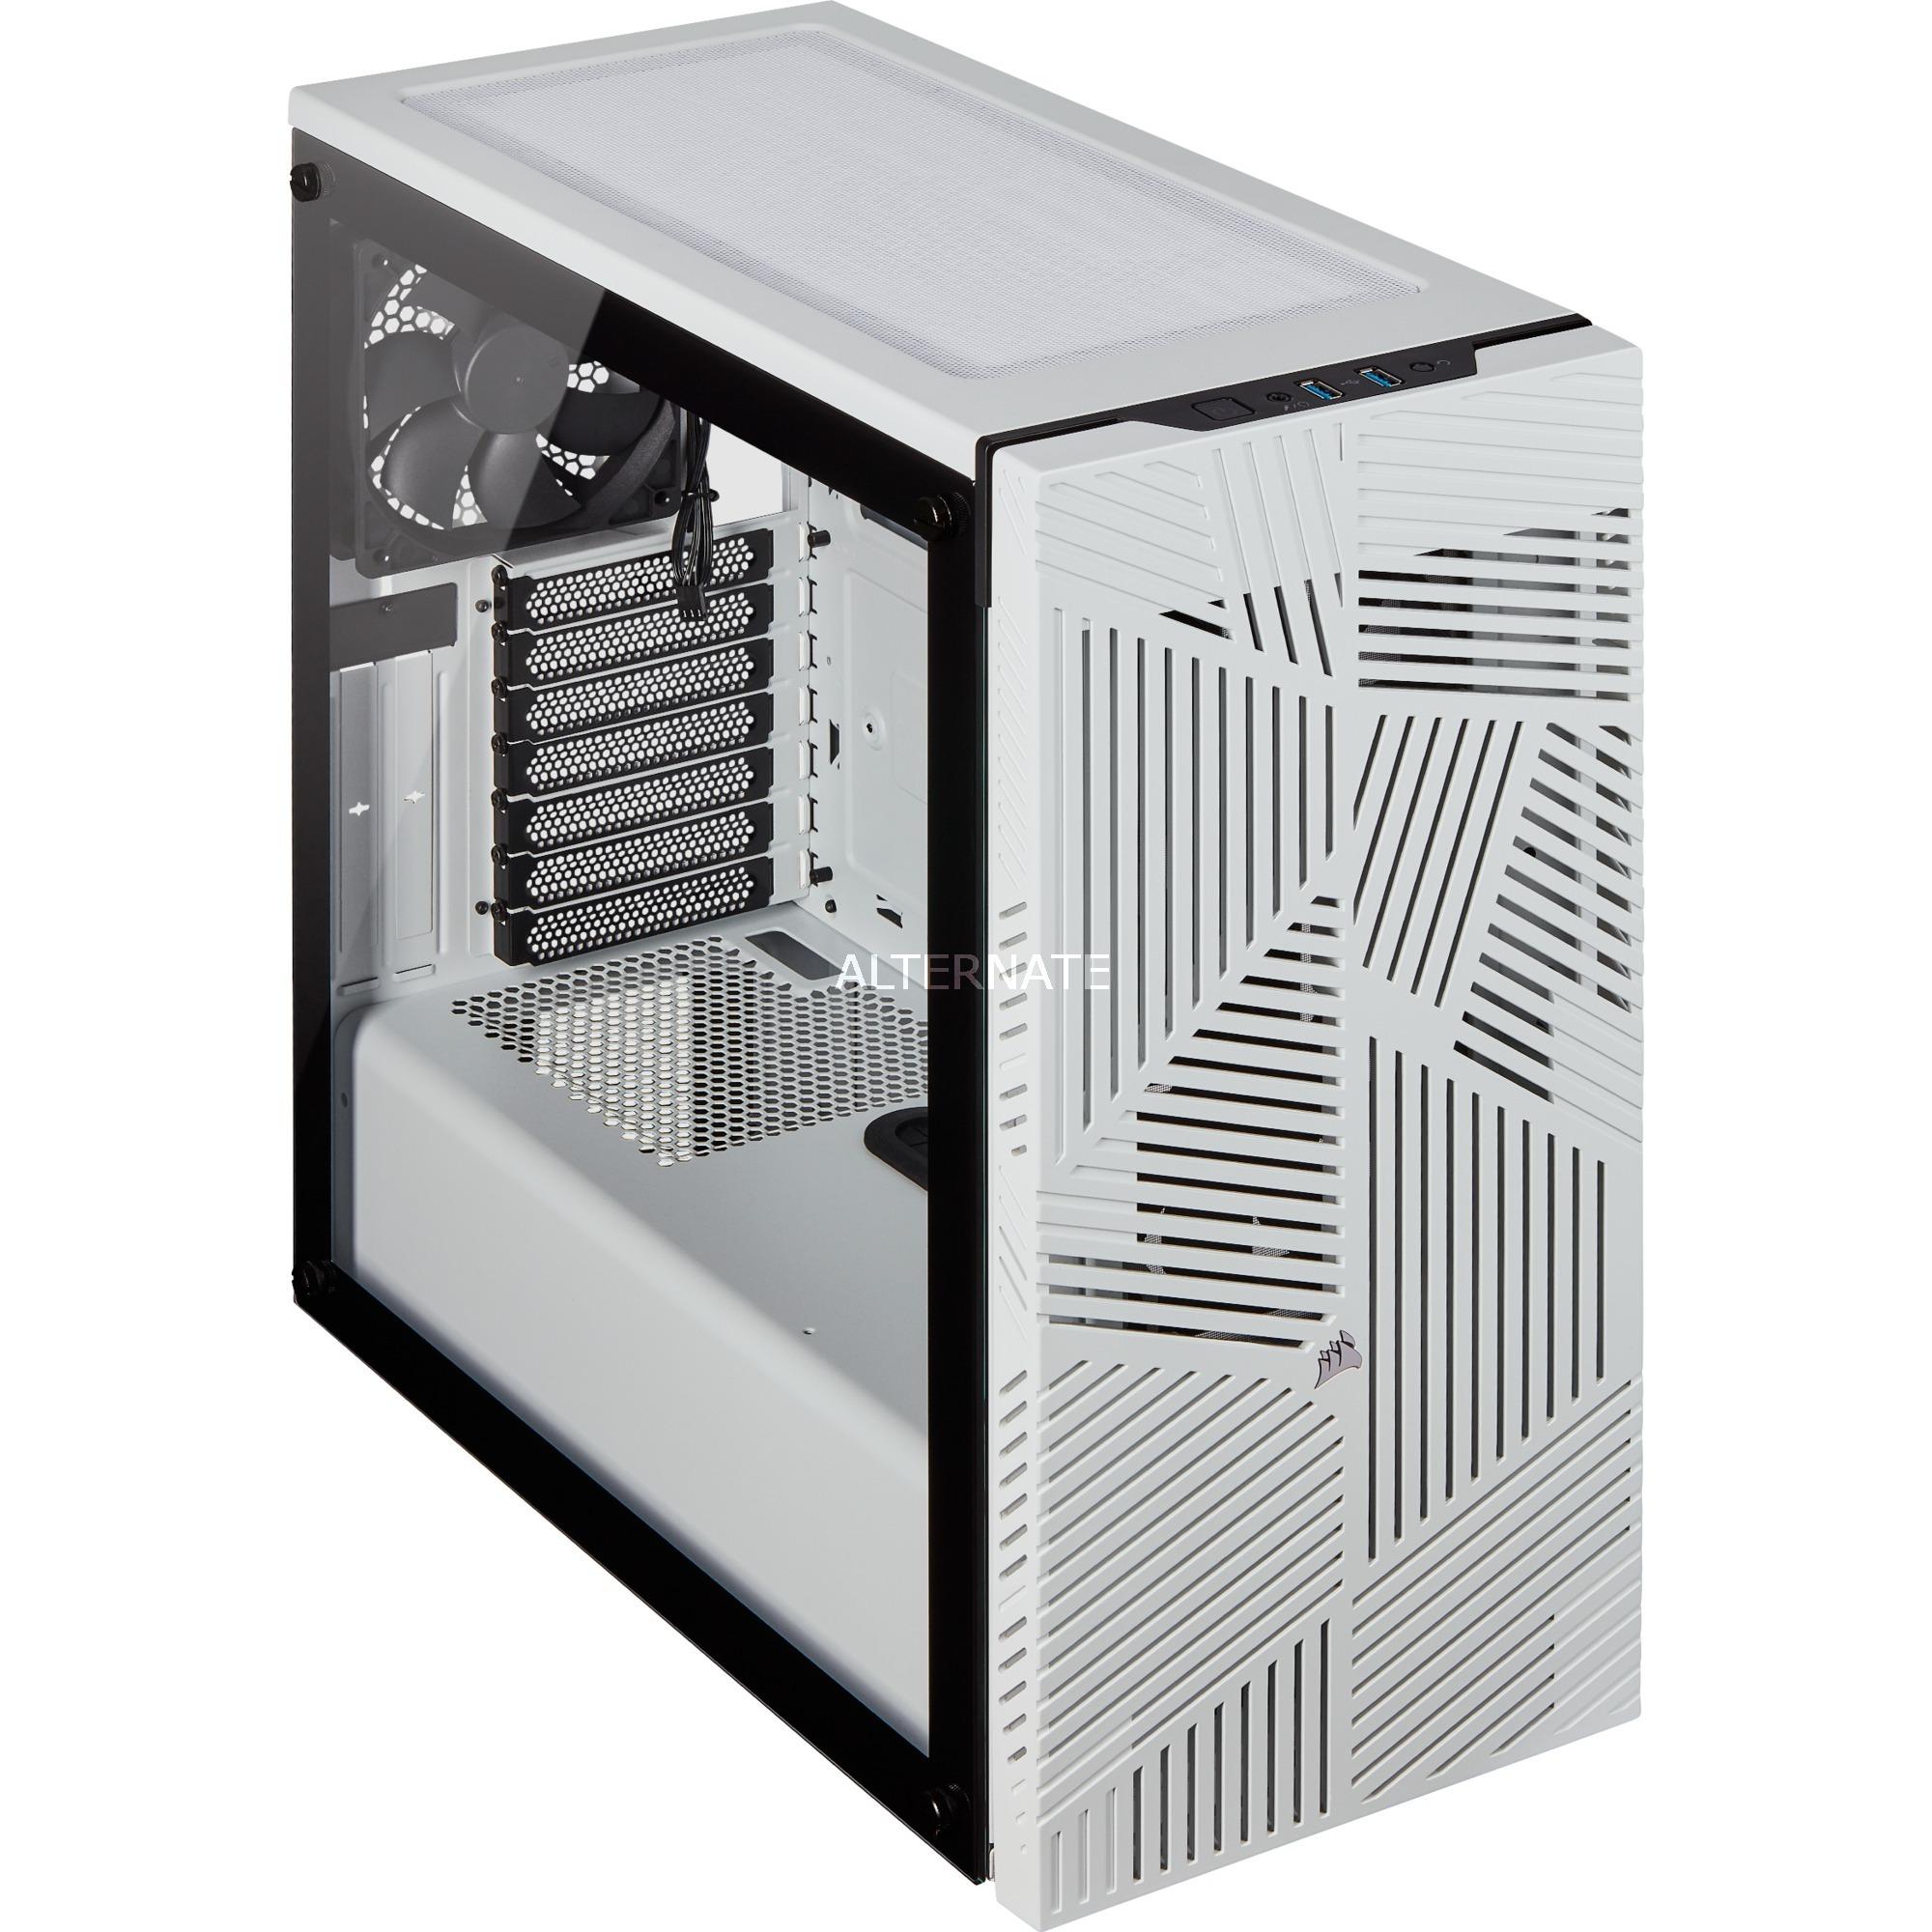 275R Airflow Midi-Tower Blanco, Cajas de torre